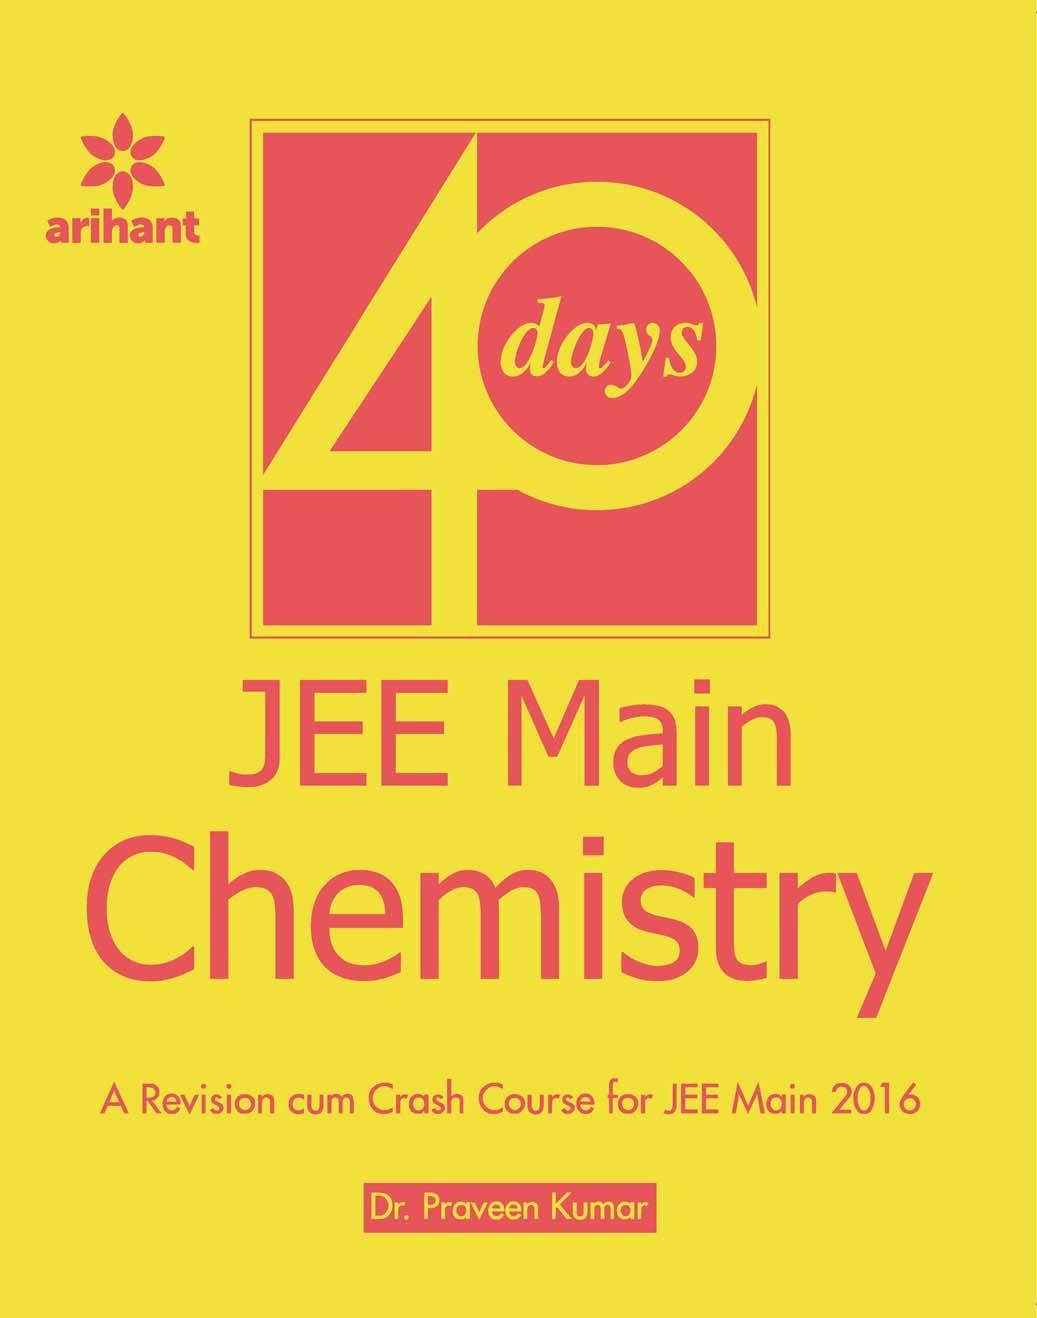 JEE Main CHEMSISTRY in 40 Days pdf